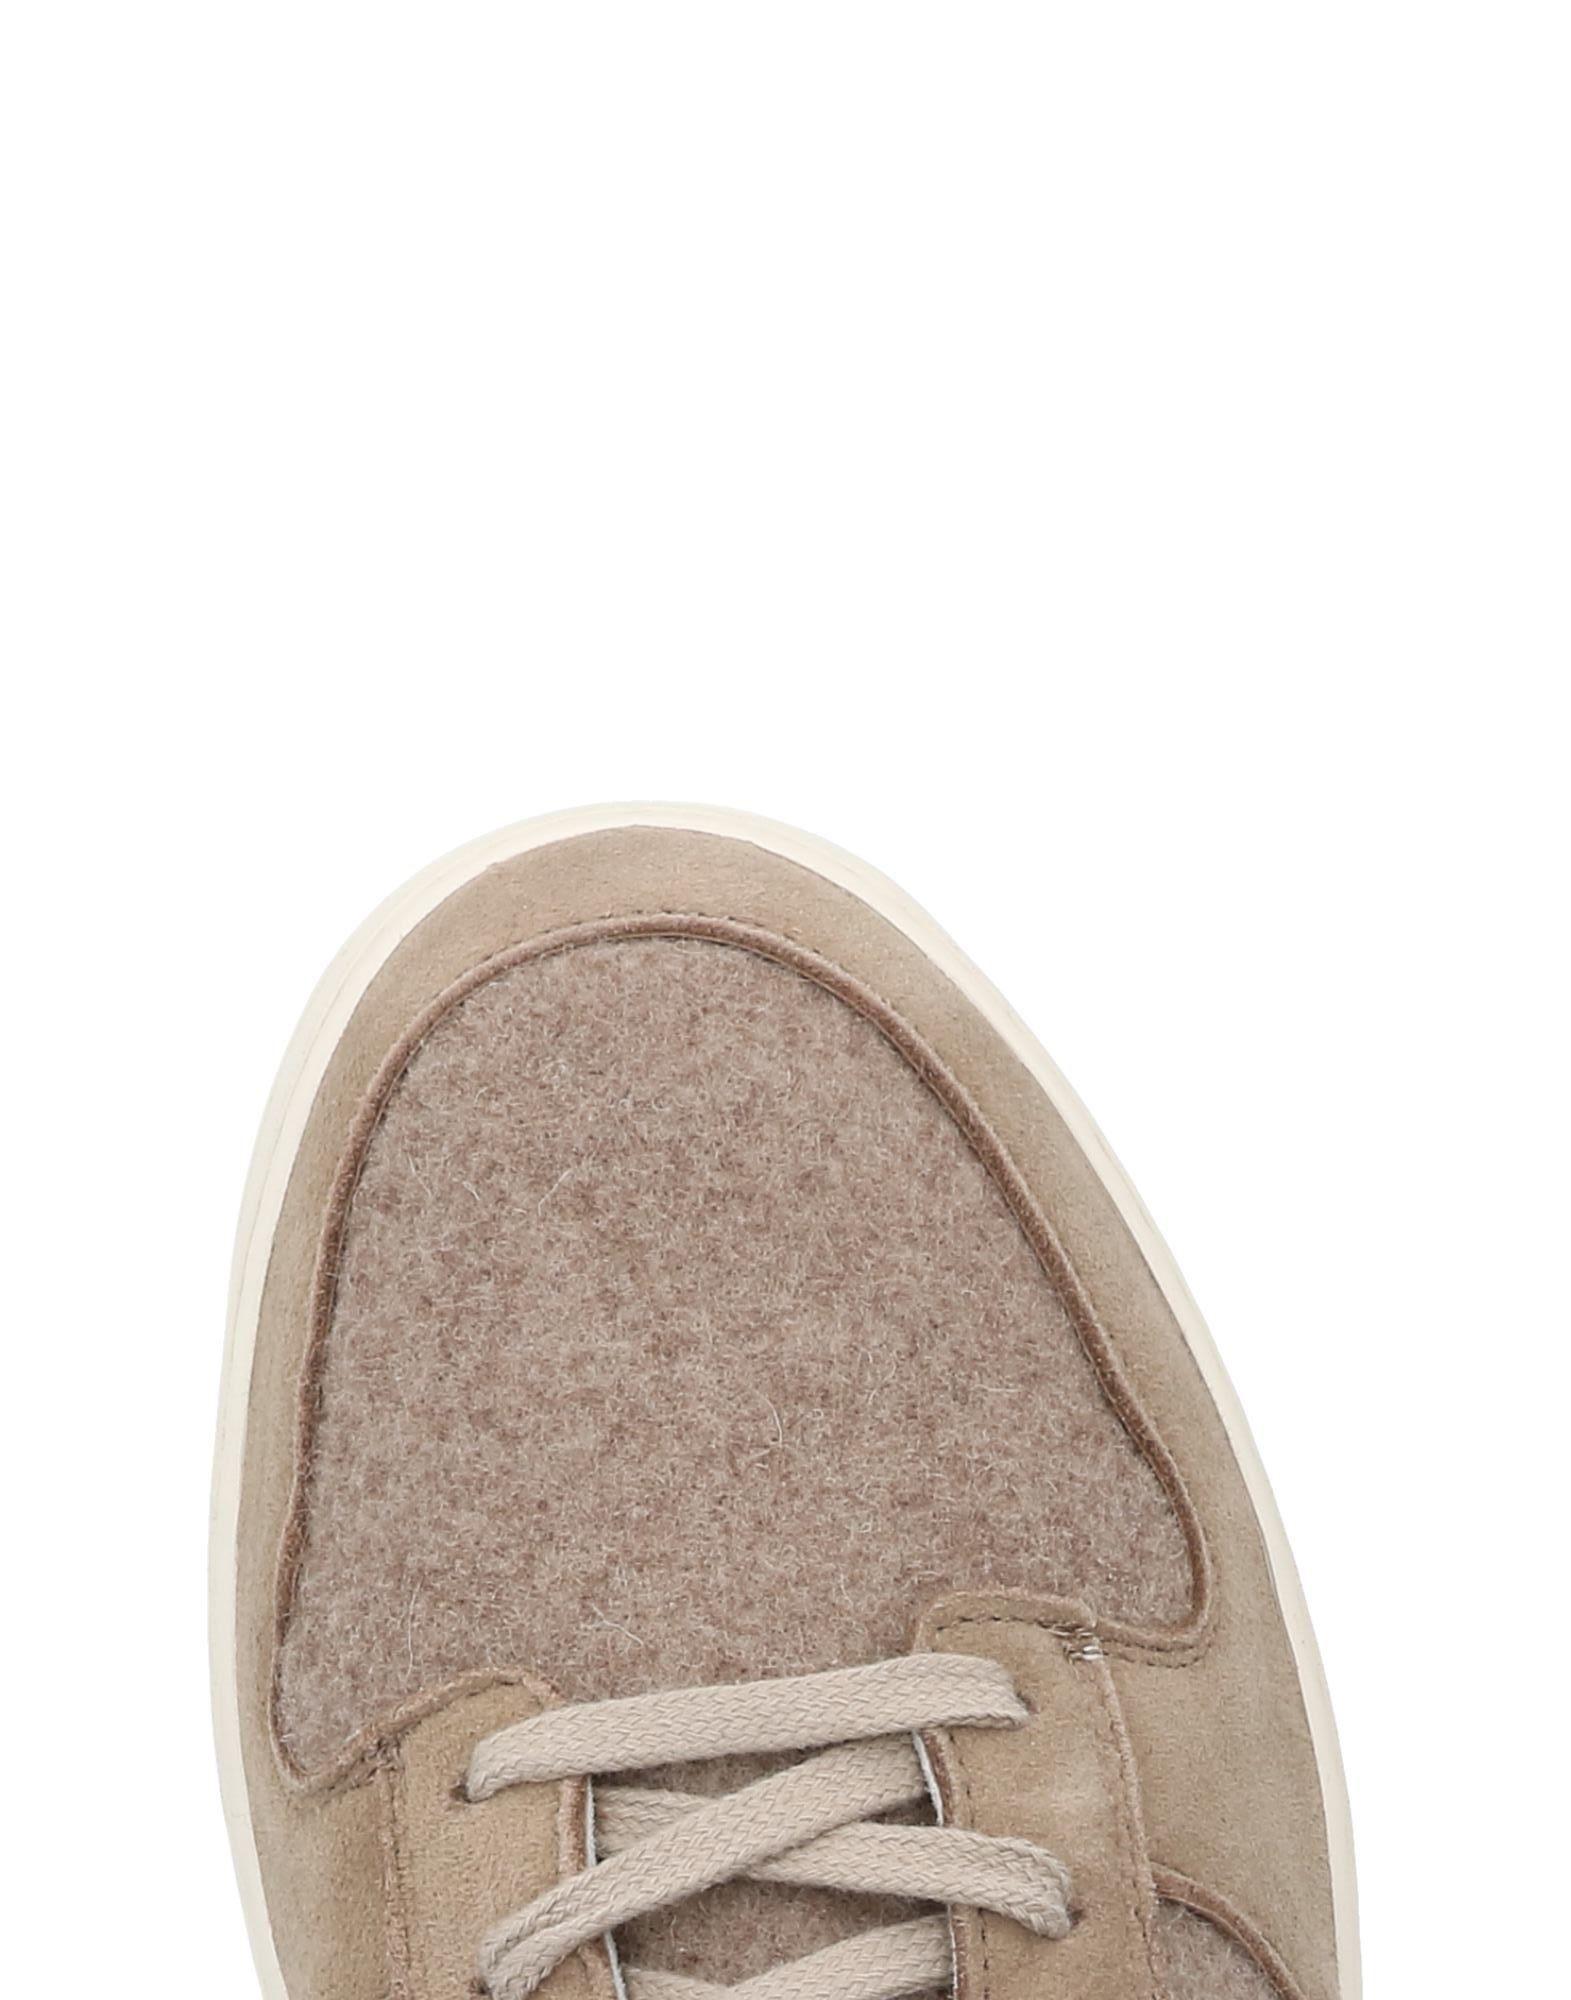 Diemme Sneakers Herren  11418879FX Gute Qualität beliebte Schuhe